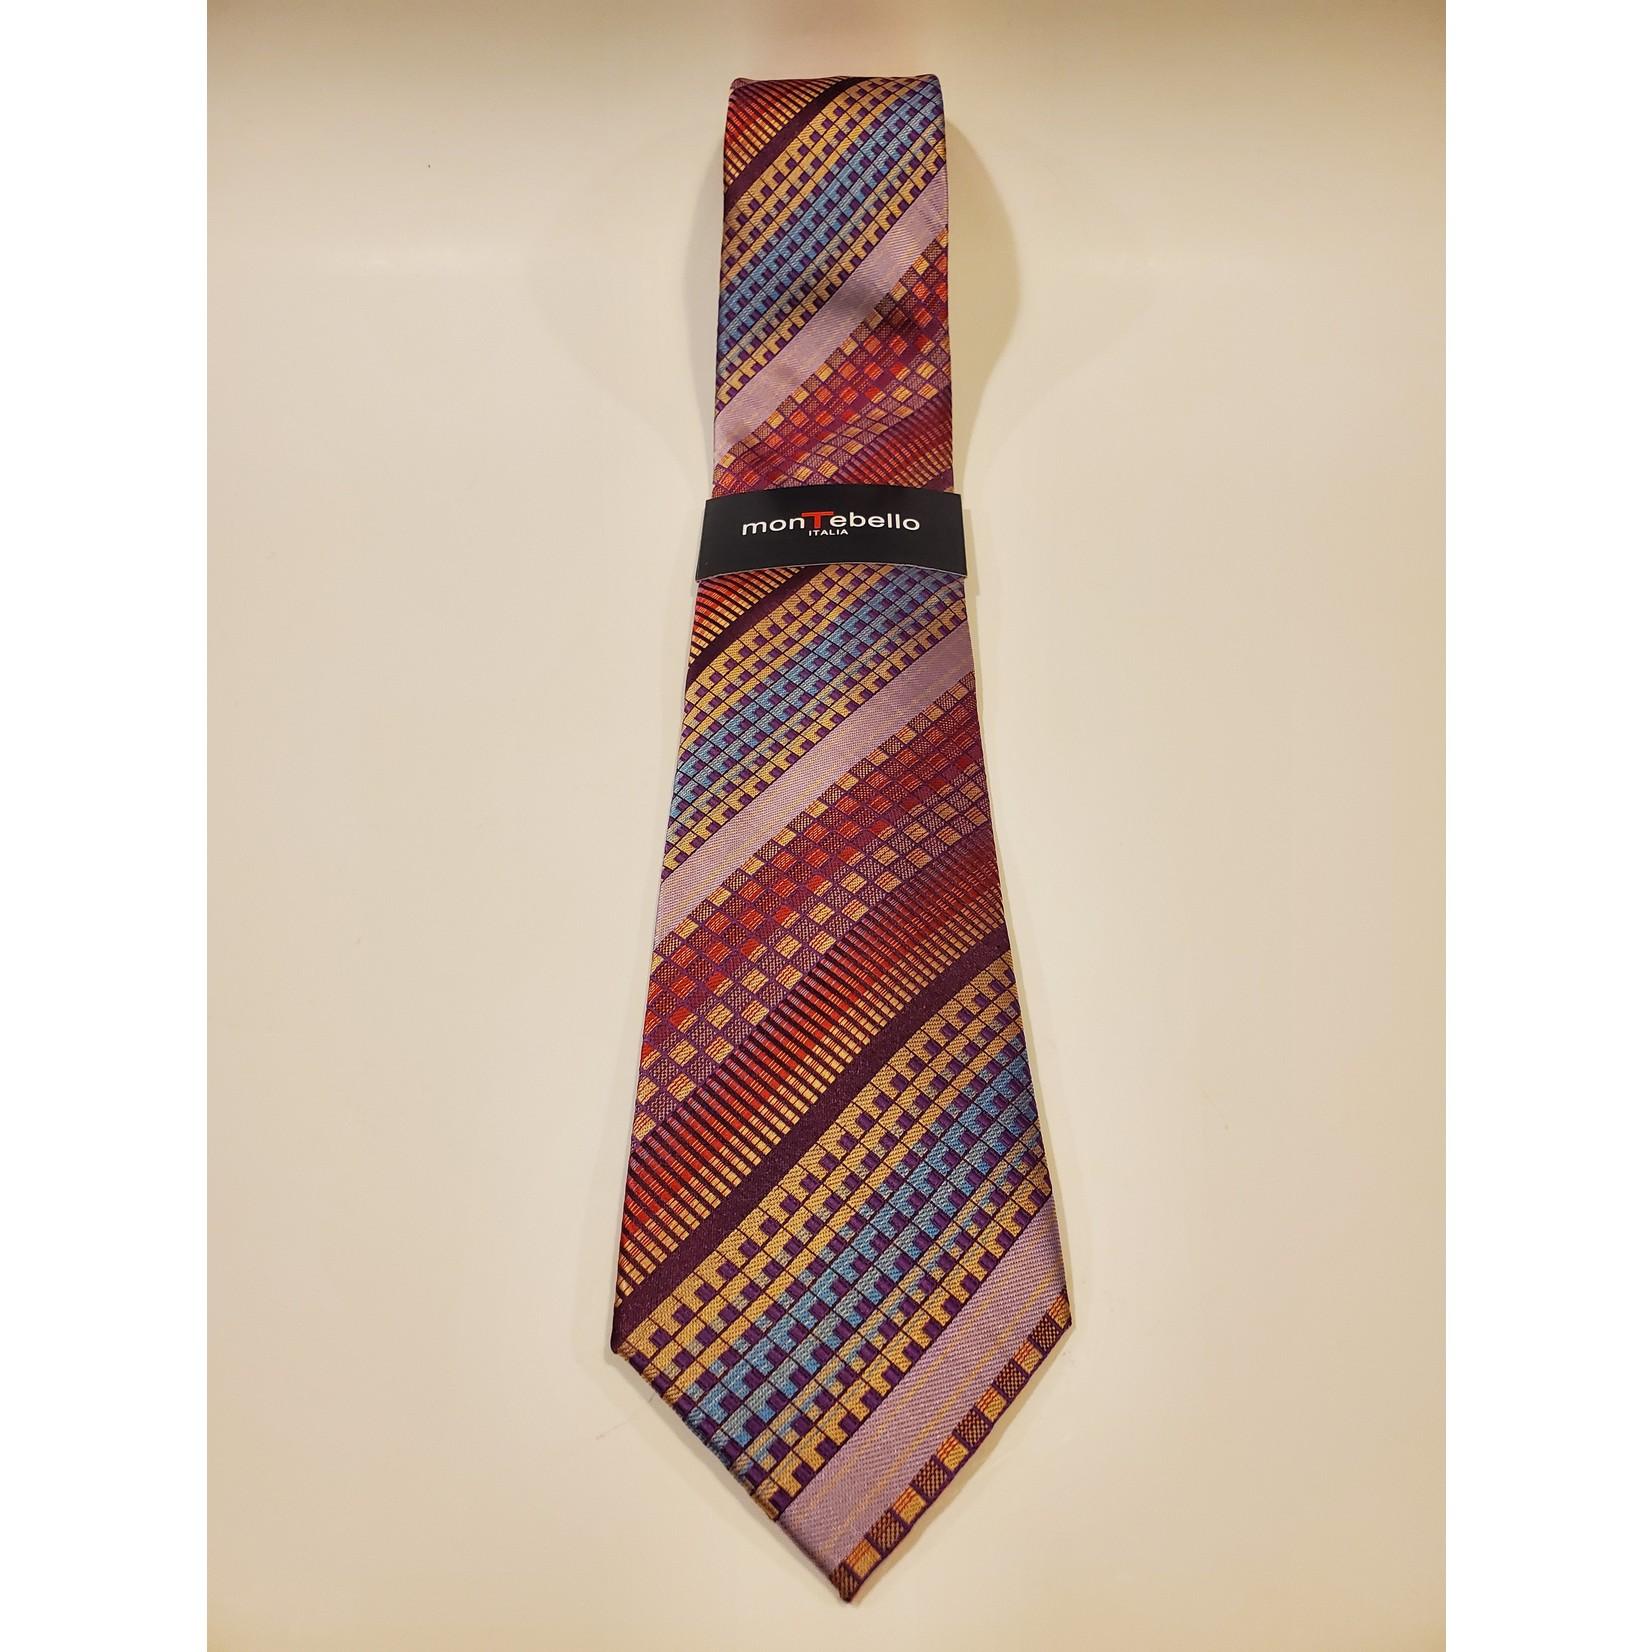 Montebello 1665 Jacquard Silk Tie Pink Geo Stripes